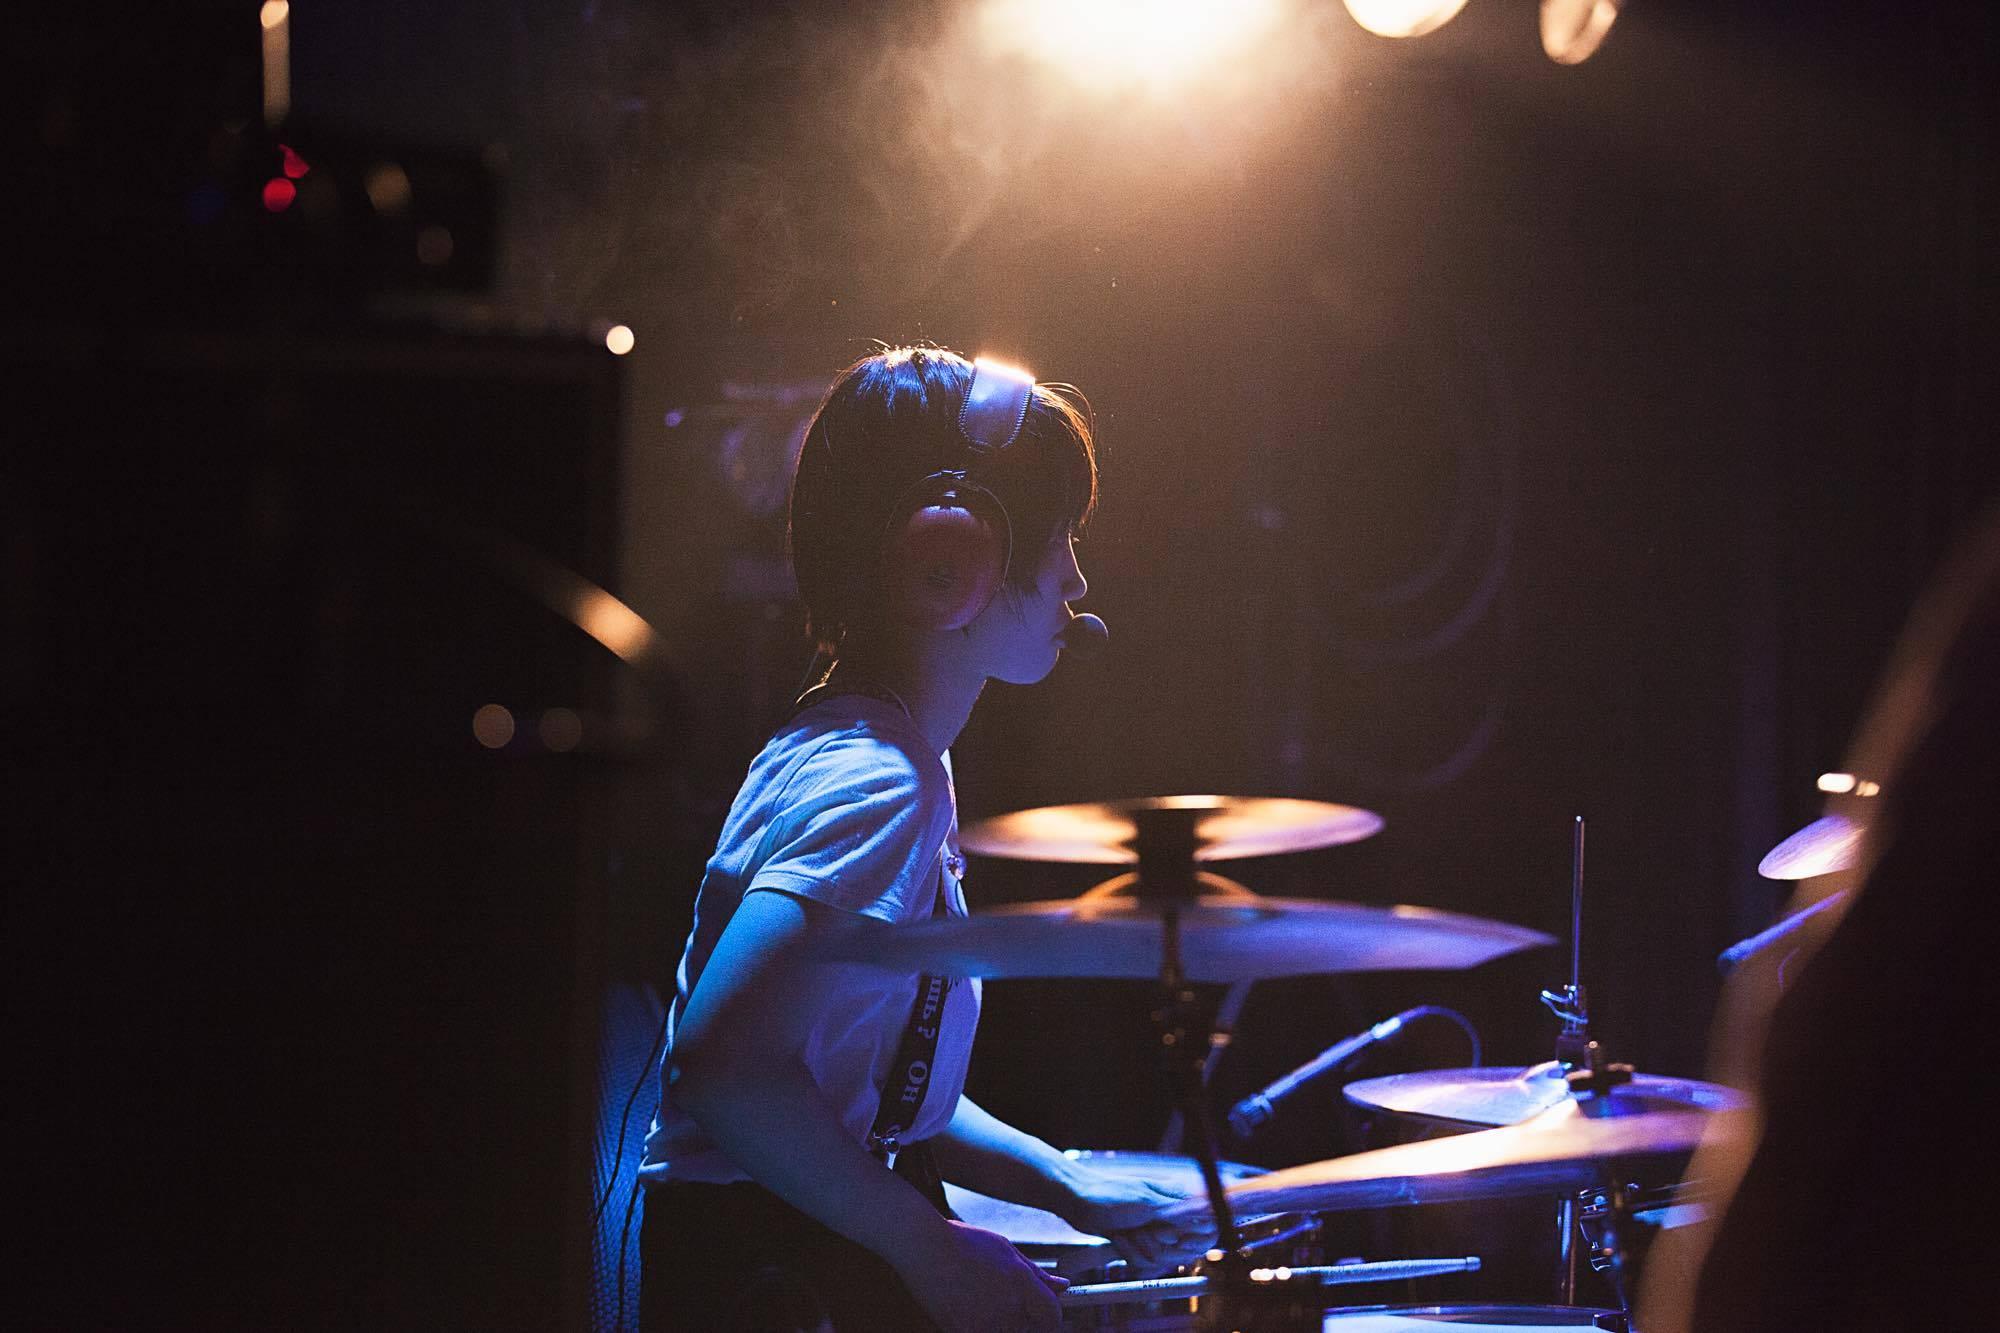 UNIDOTS live 2019 - 孵化 -